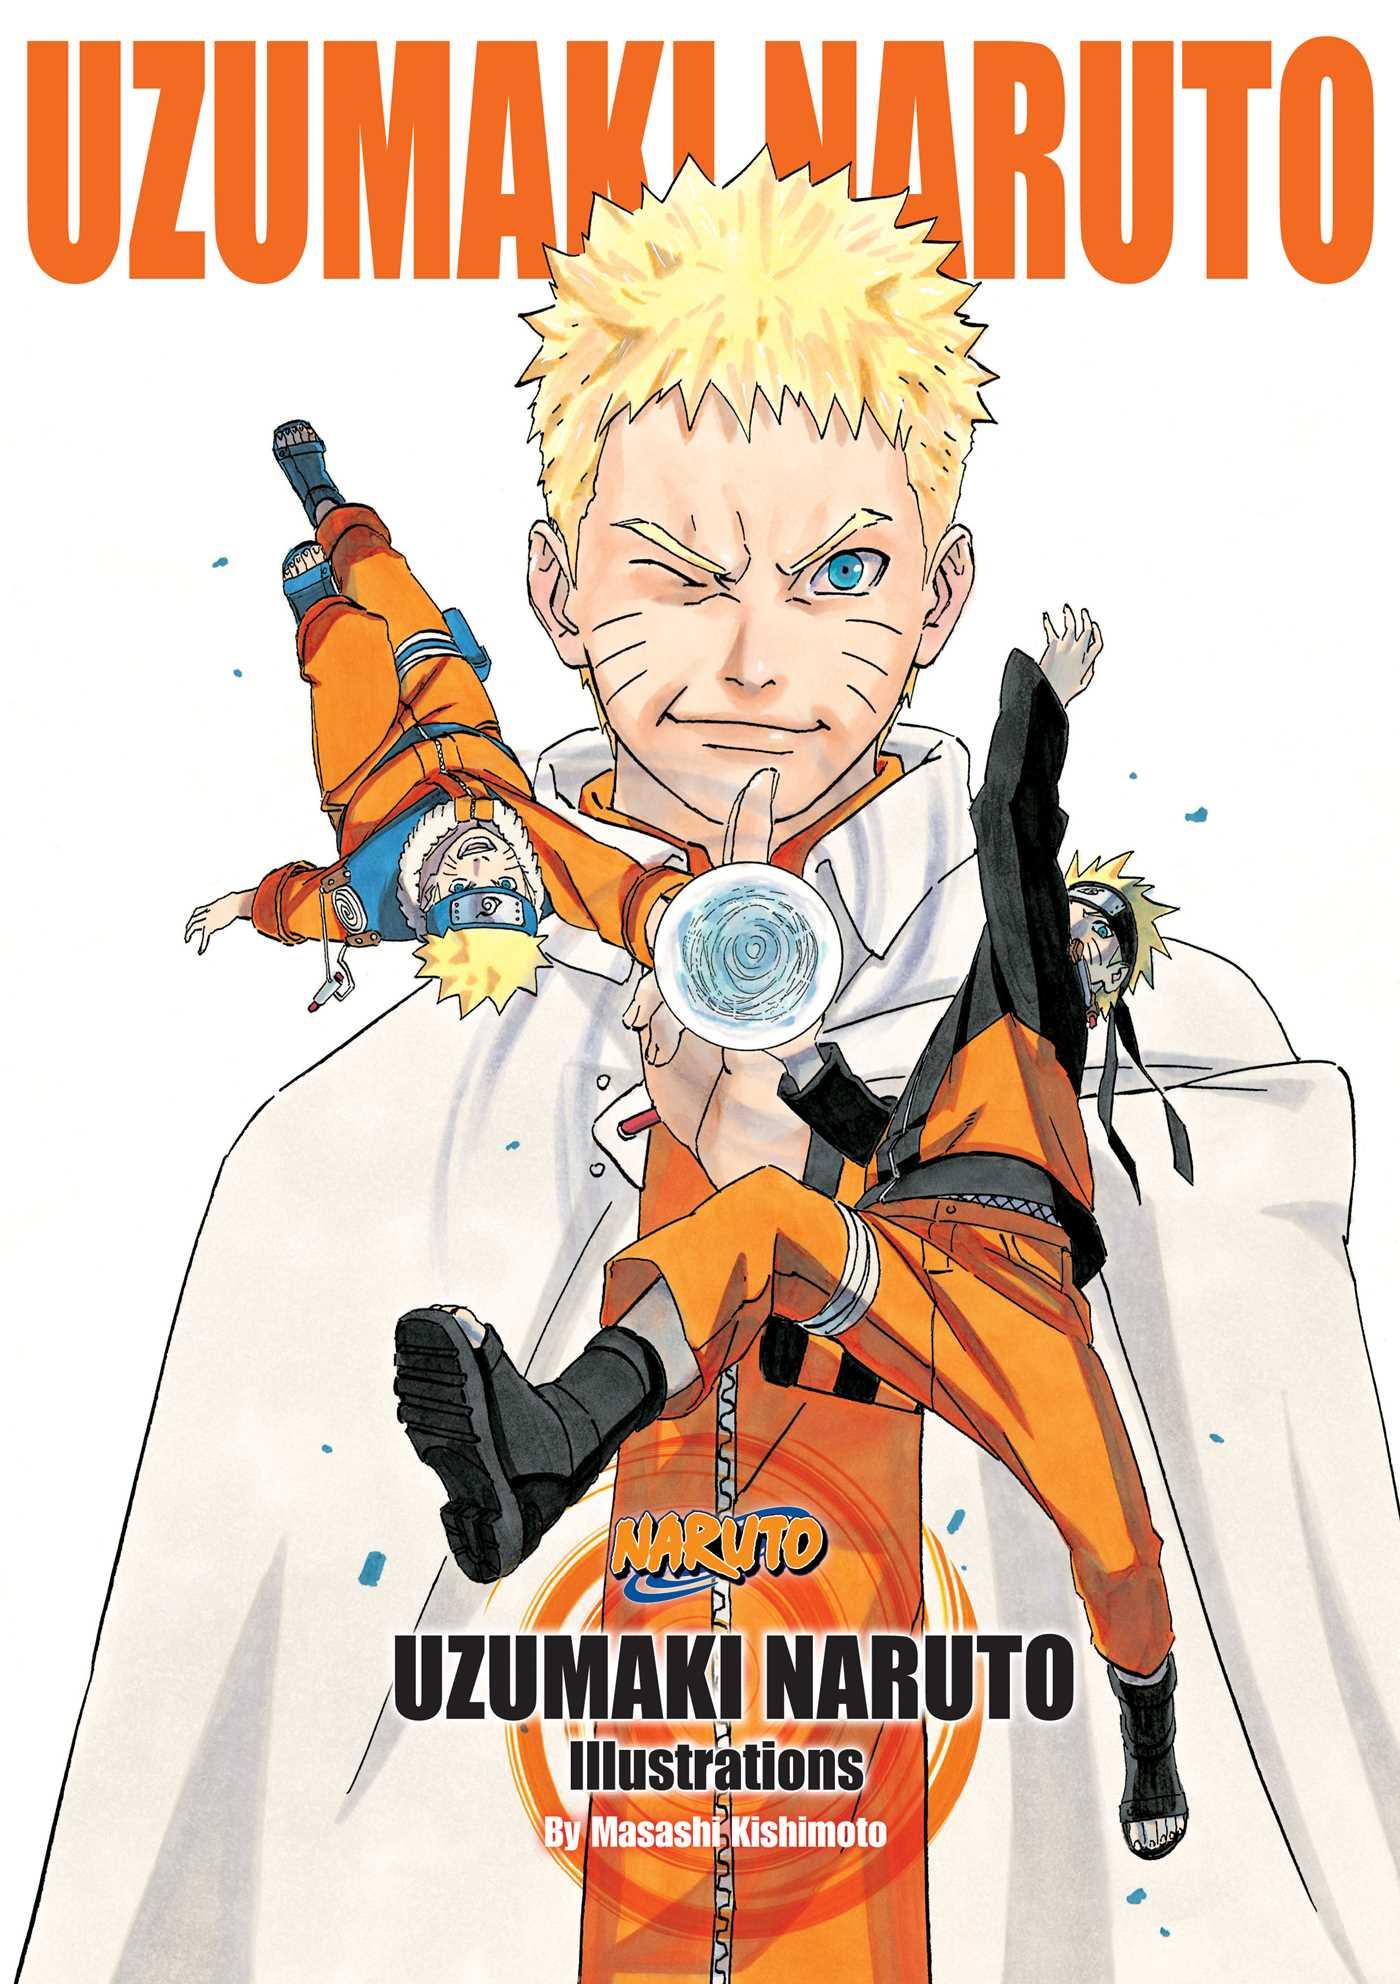 Uzumaki Naruto: Illustrations | Book by Masashi Kishimoto